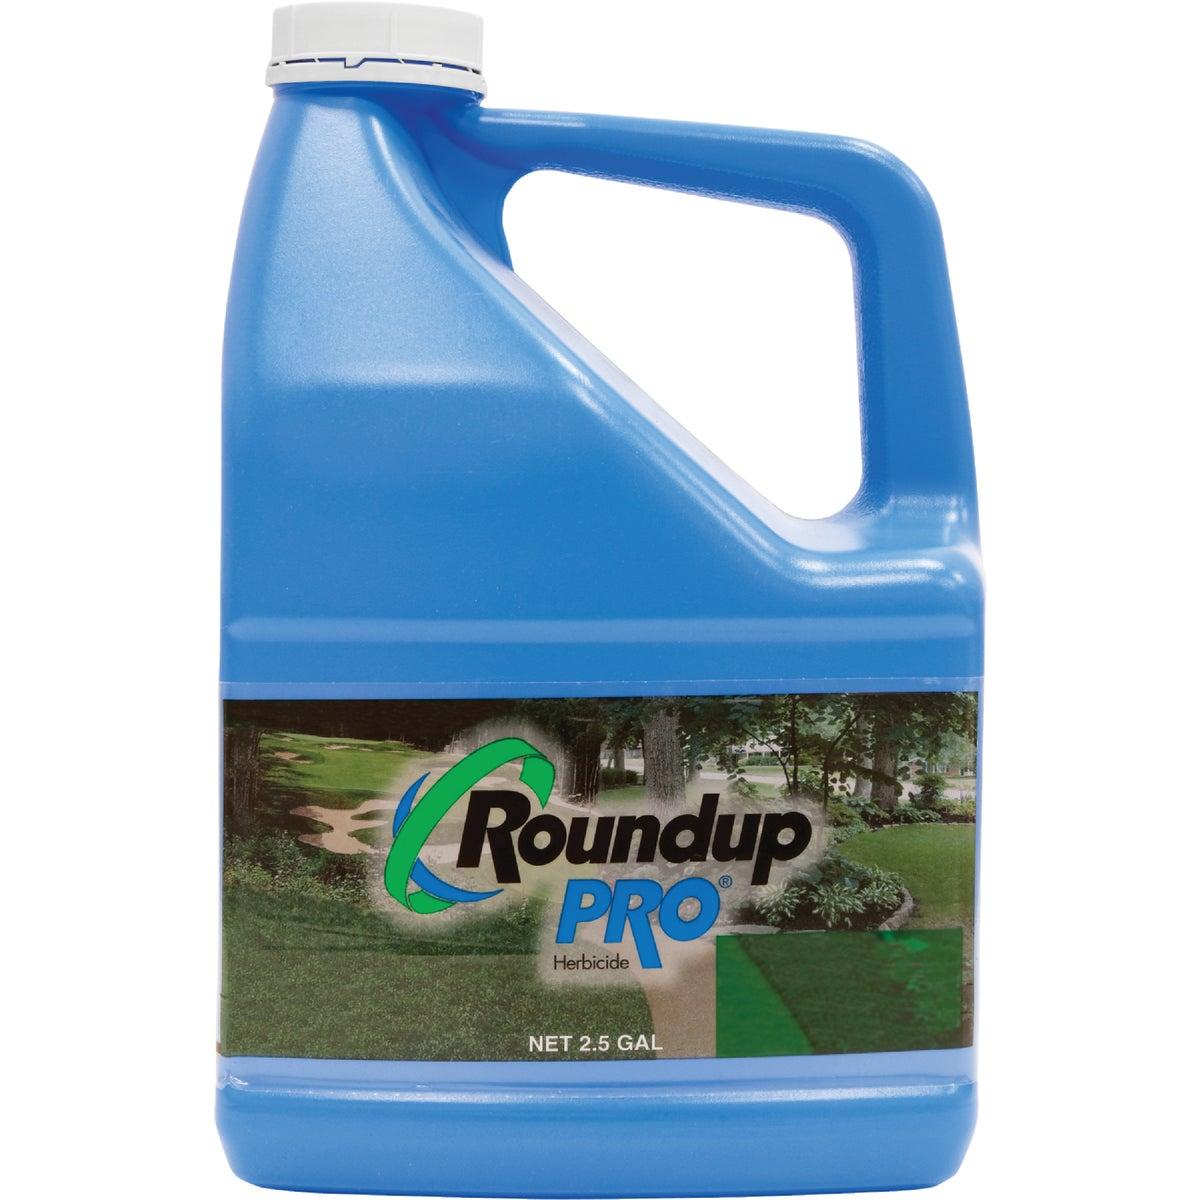 2.5GAL 41% CONC ROUNDUP